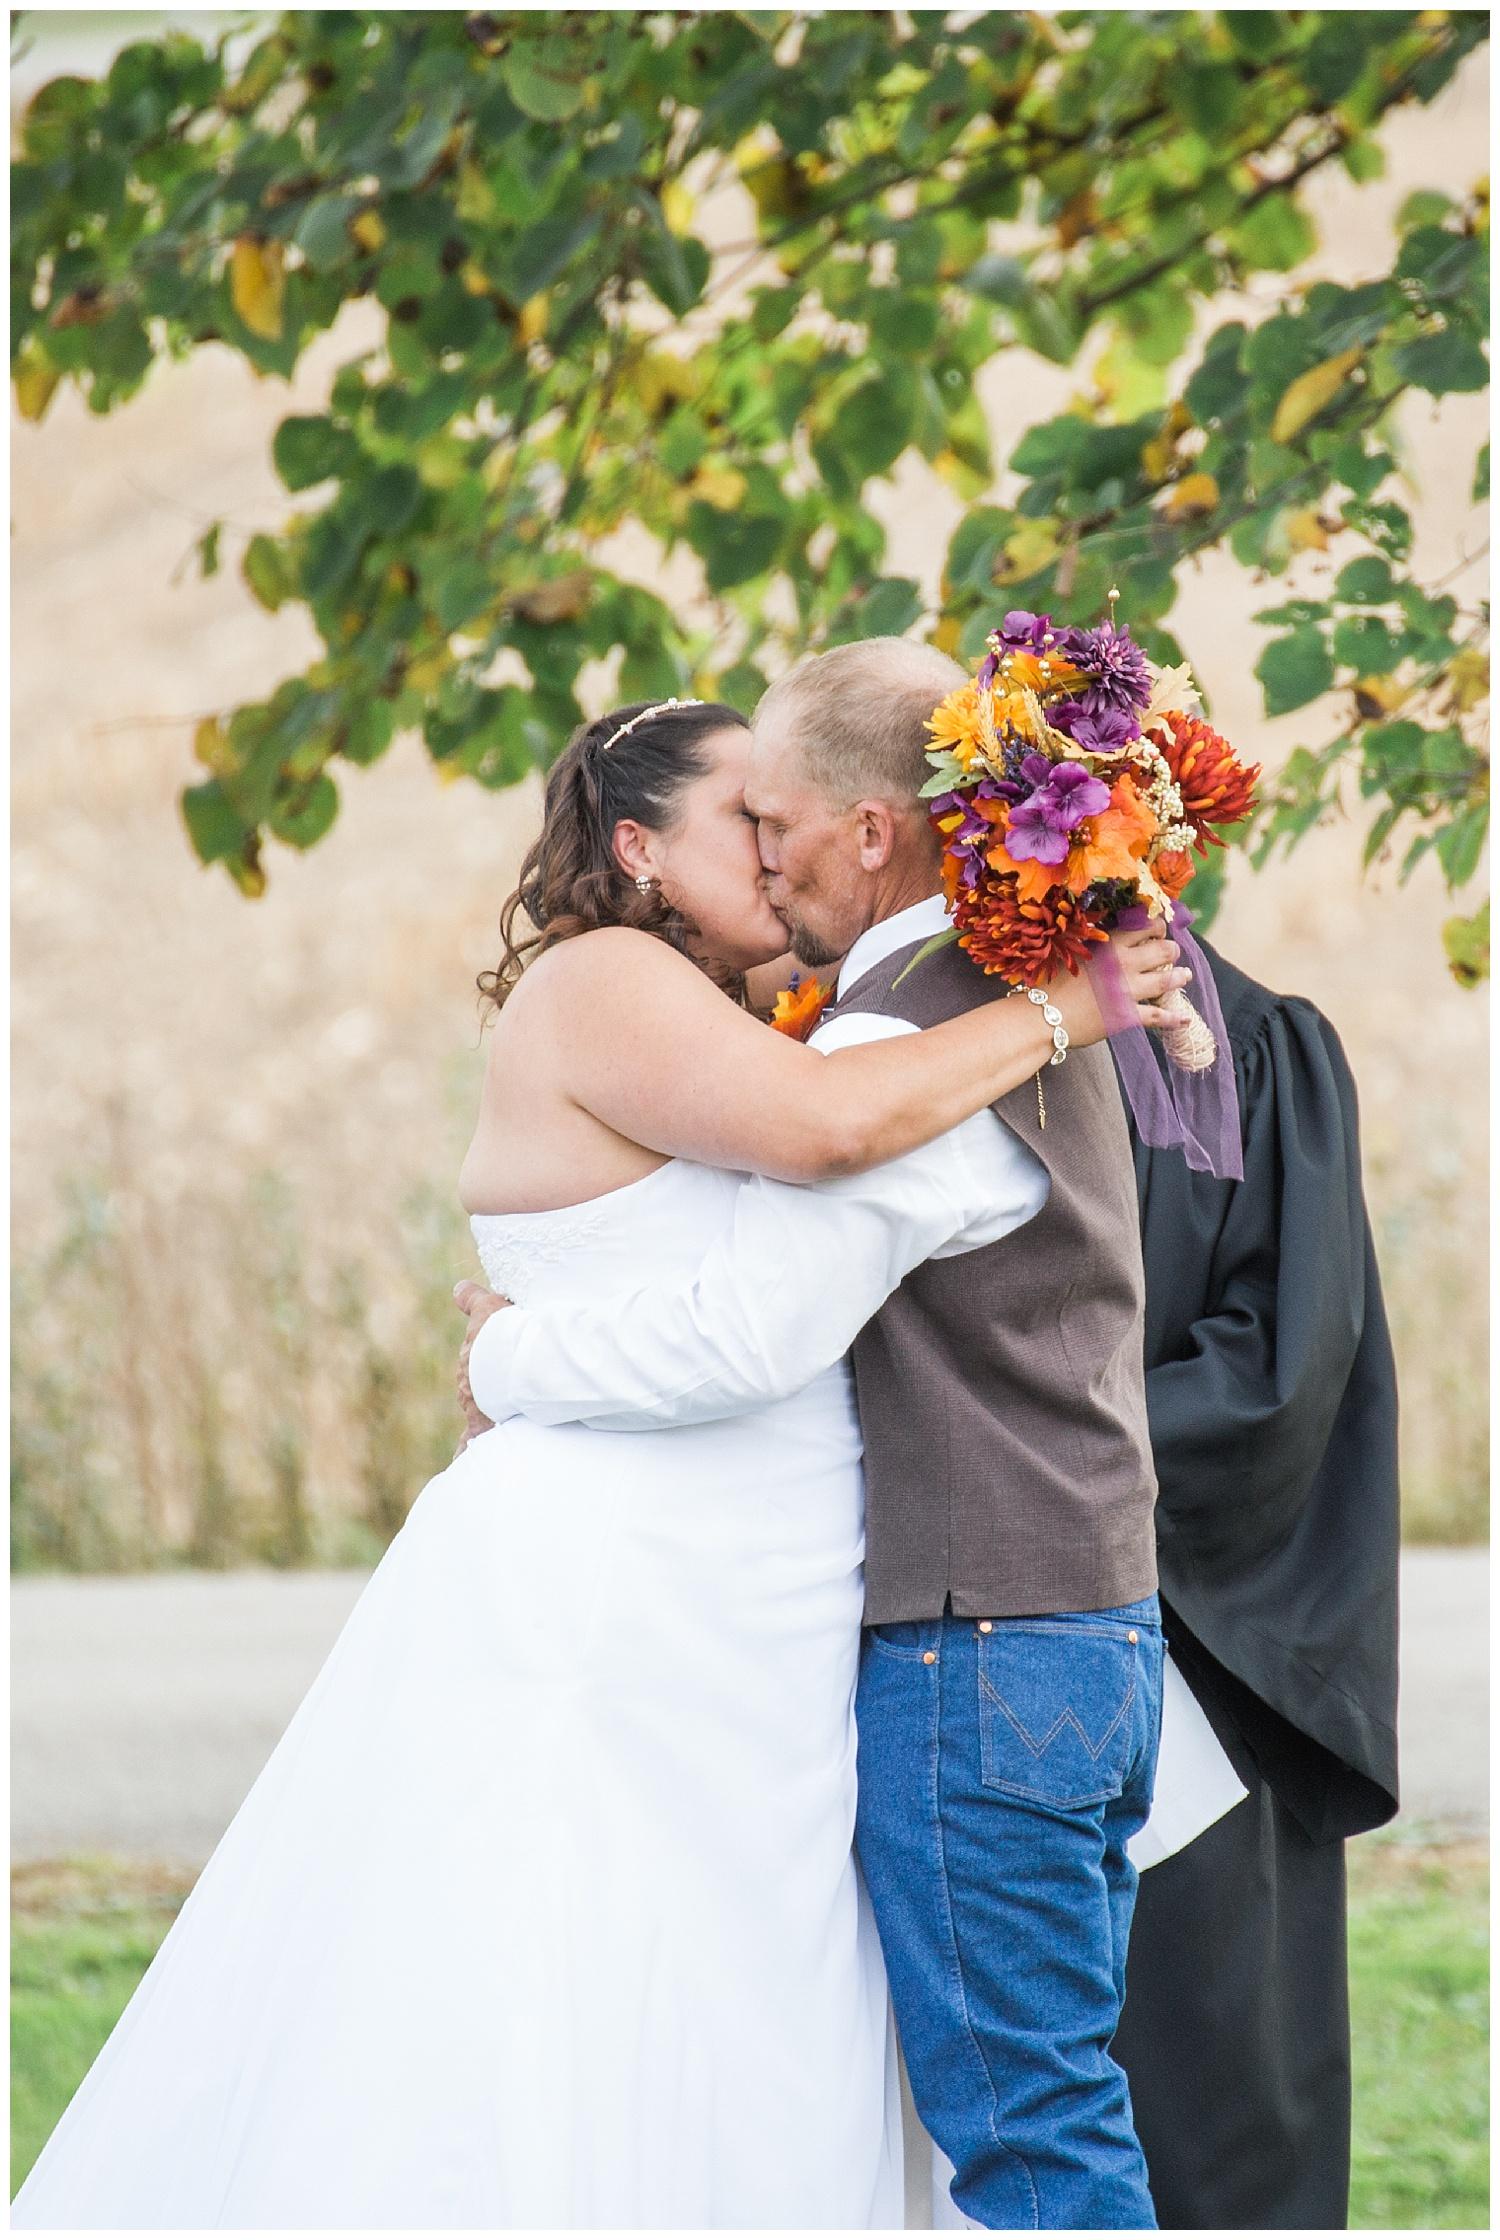 The Hall Wedding - York NY - Lass and Beau-454_Buffalo wedding photography.jpg